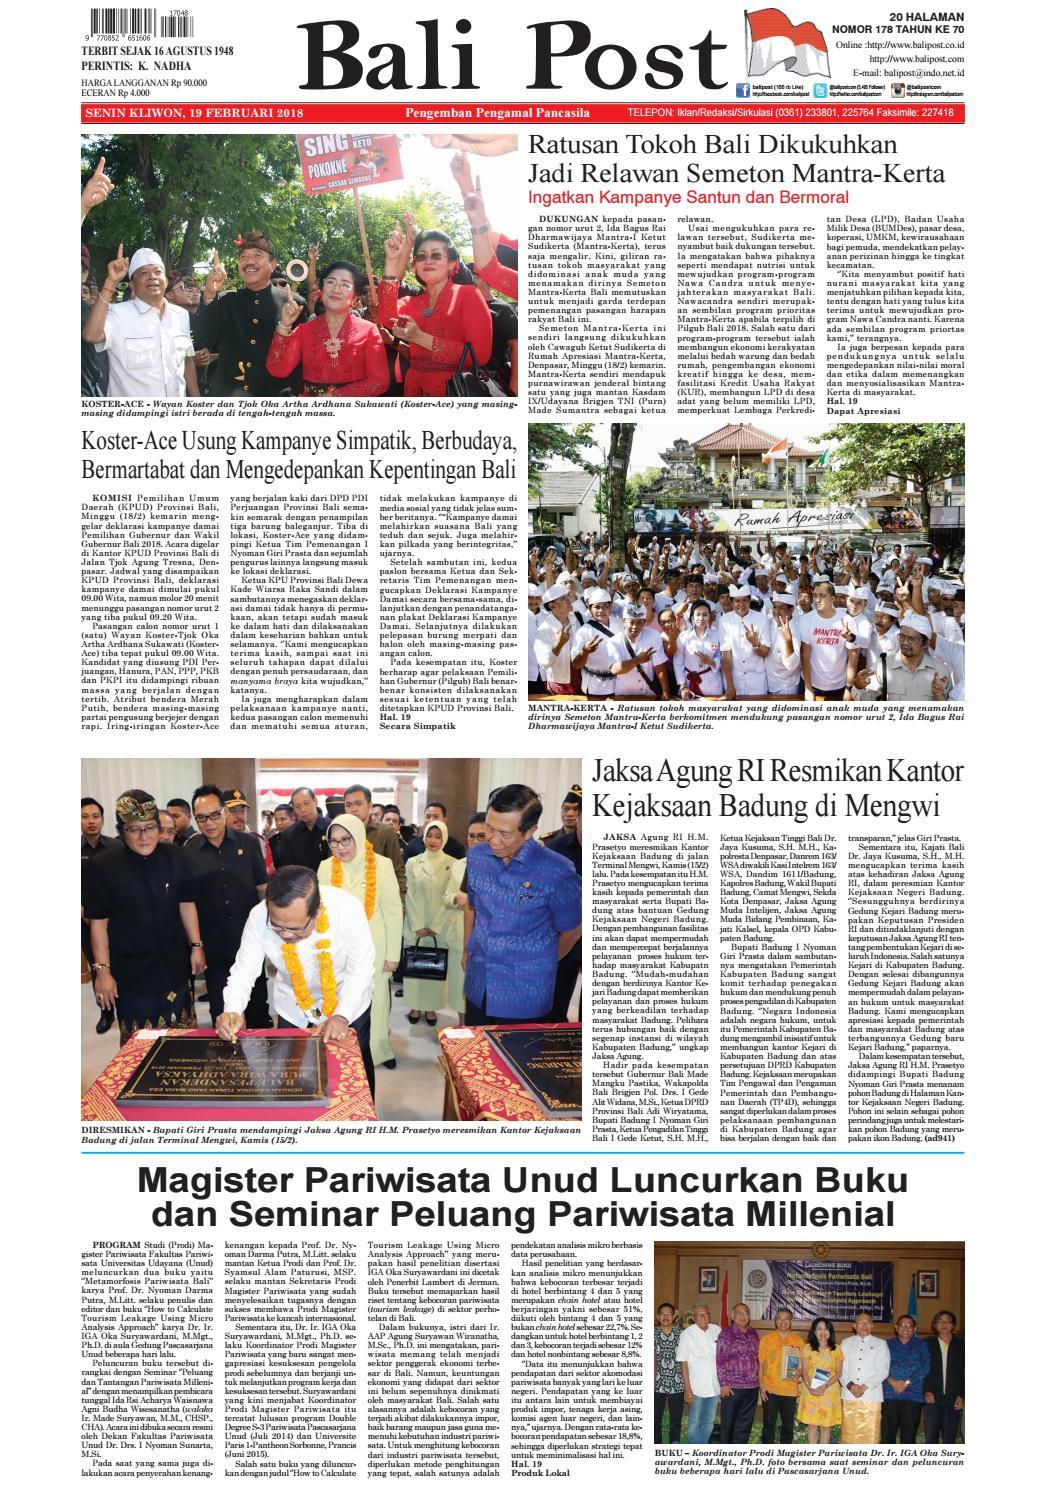 Edisi 19 Februari 2018 Balipostcom By E Paper Kmb Issuu So Hup Wan Enceran